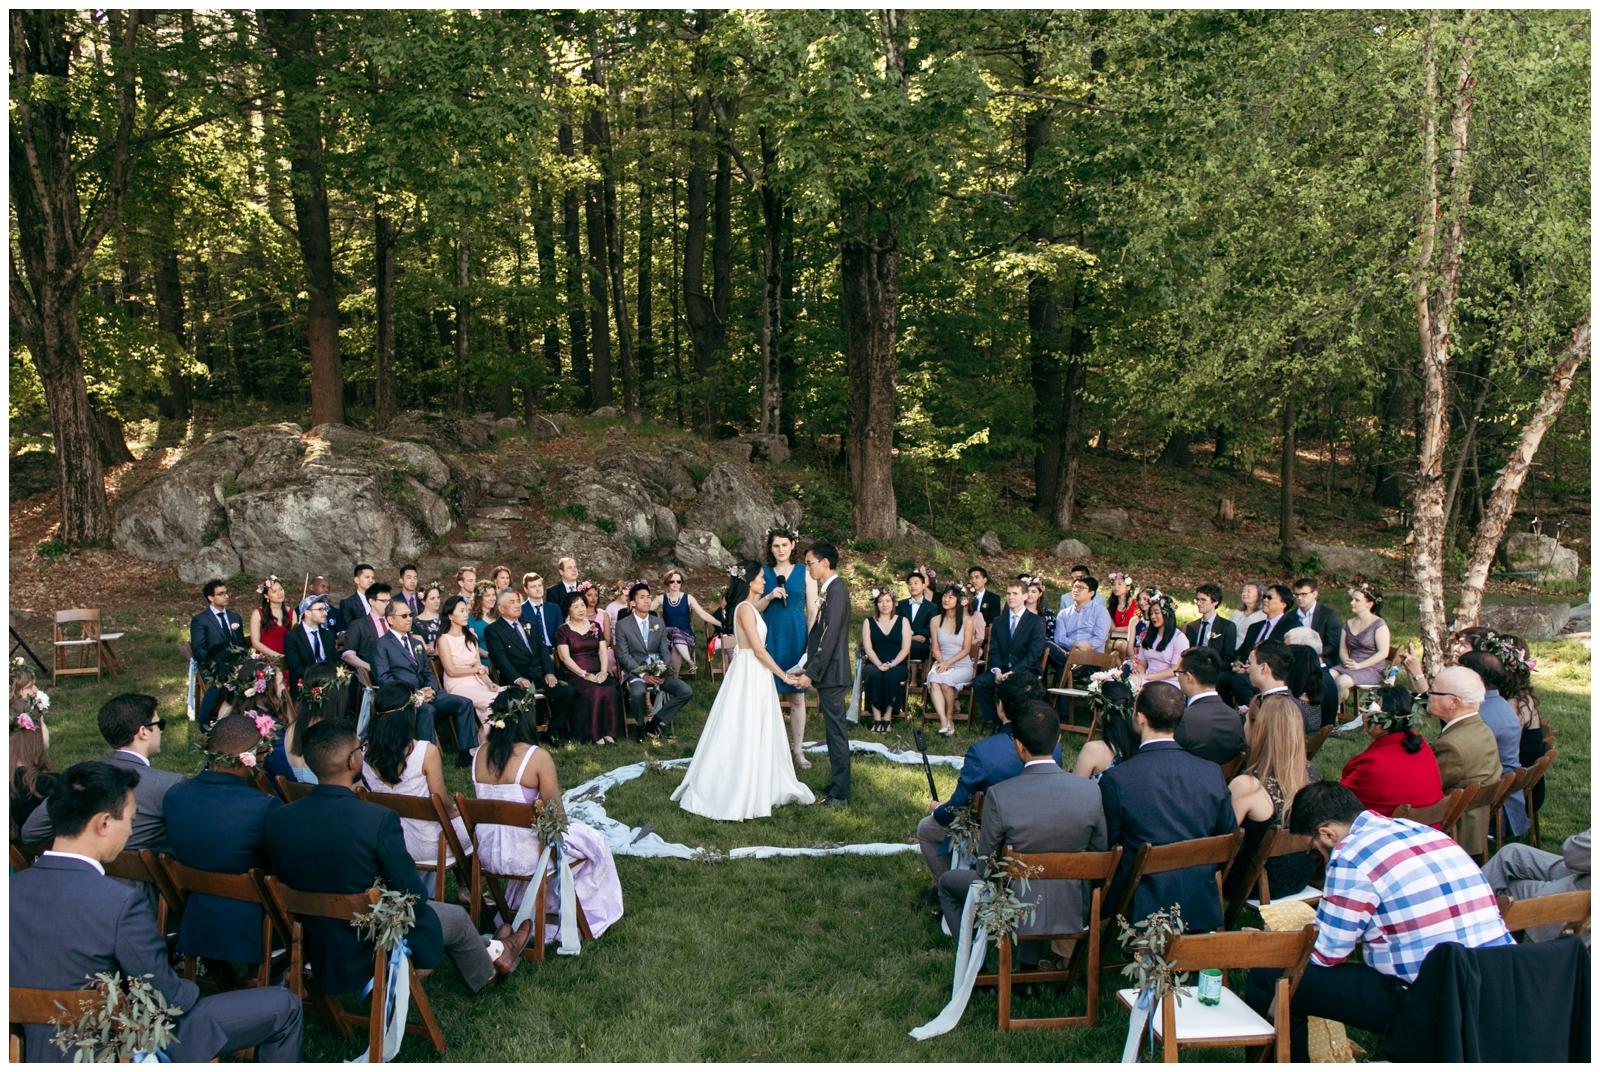 Friendly crossways wedding